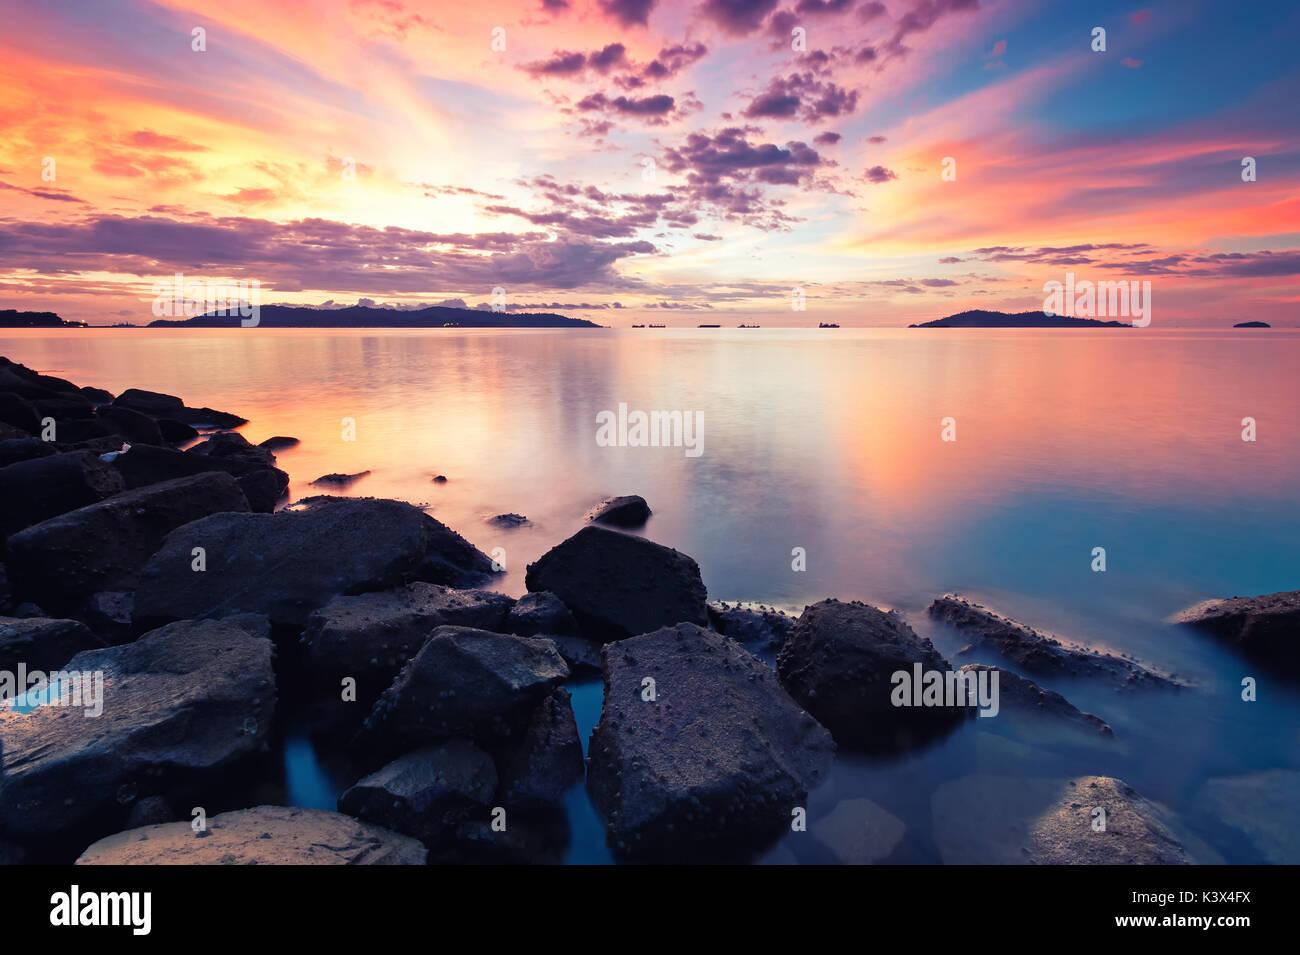 Stunning sunset in Kota Kinabalu beach, Tanjung Lipat in Sabah Borneo, Malaysia. - Stock Image